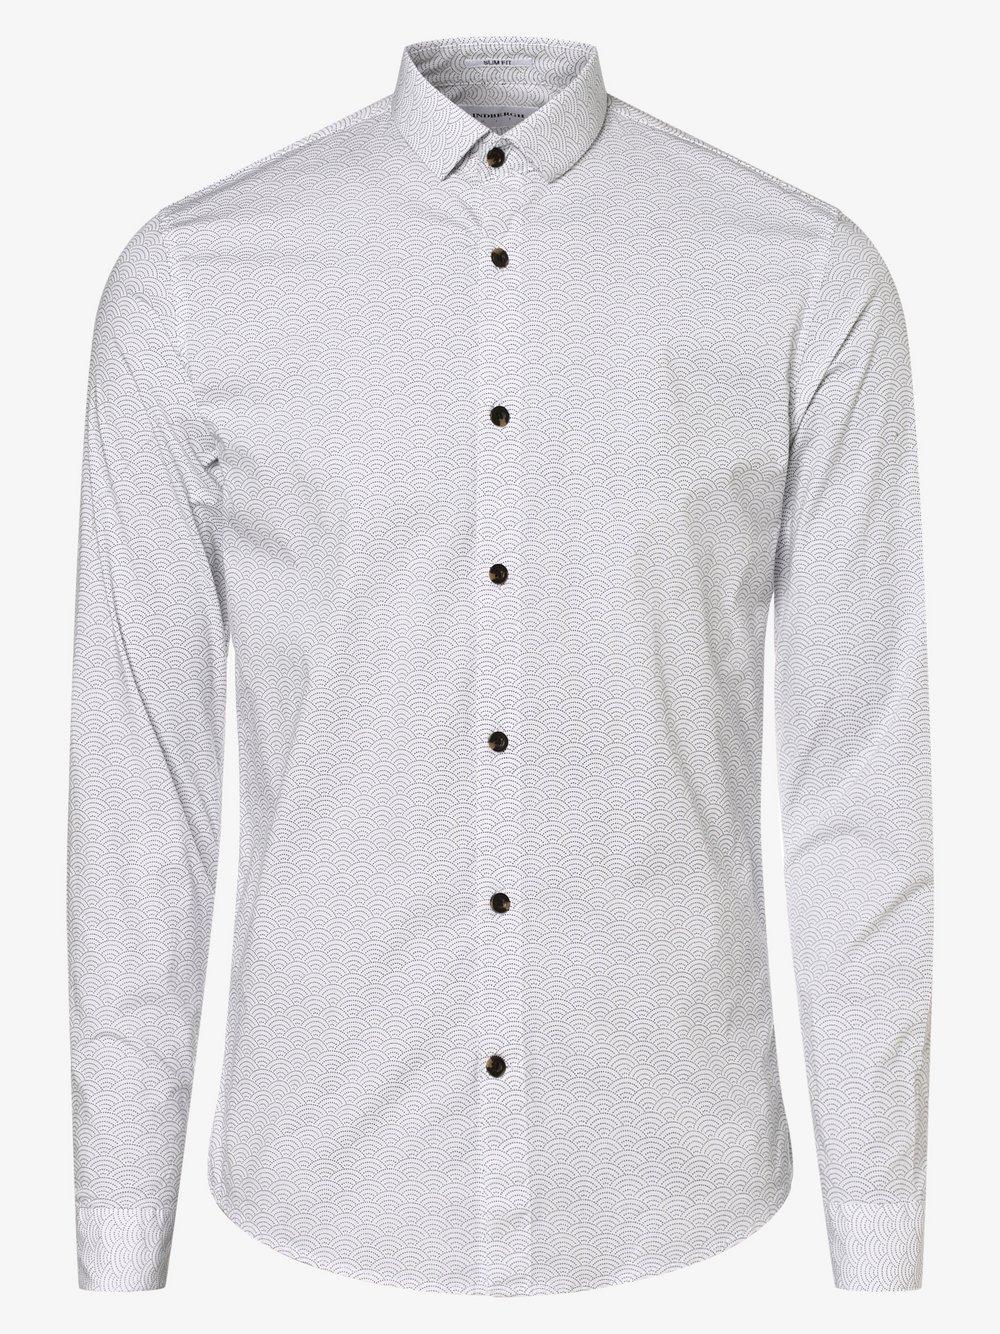 Lindbergh – Koszula męska, biały Van Graaf 477580-0001-09920